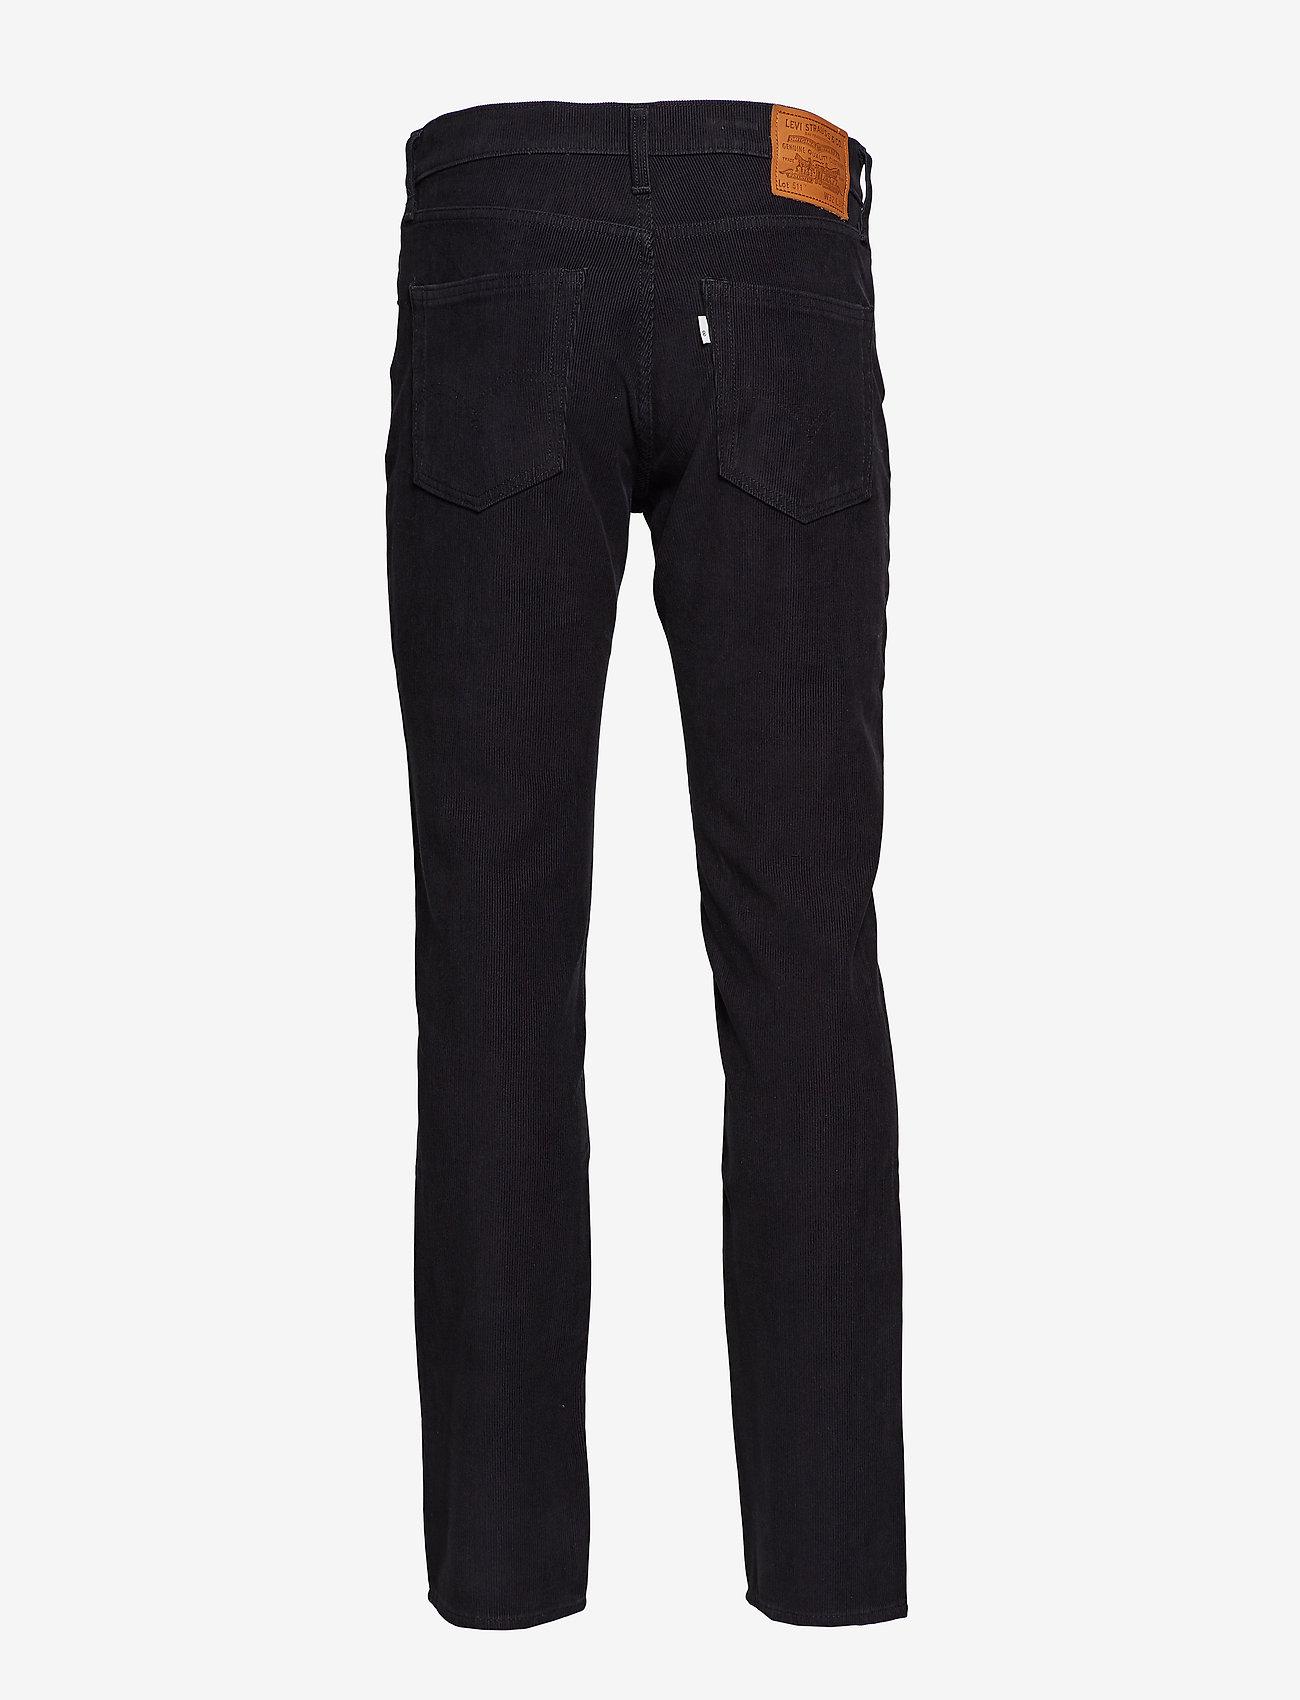 LEVI´S Men - 511 SLIM FIT CAVIAR WARP STR C - pantalons chino - blacks